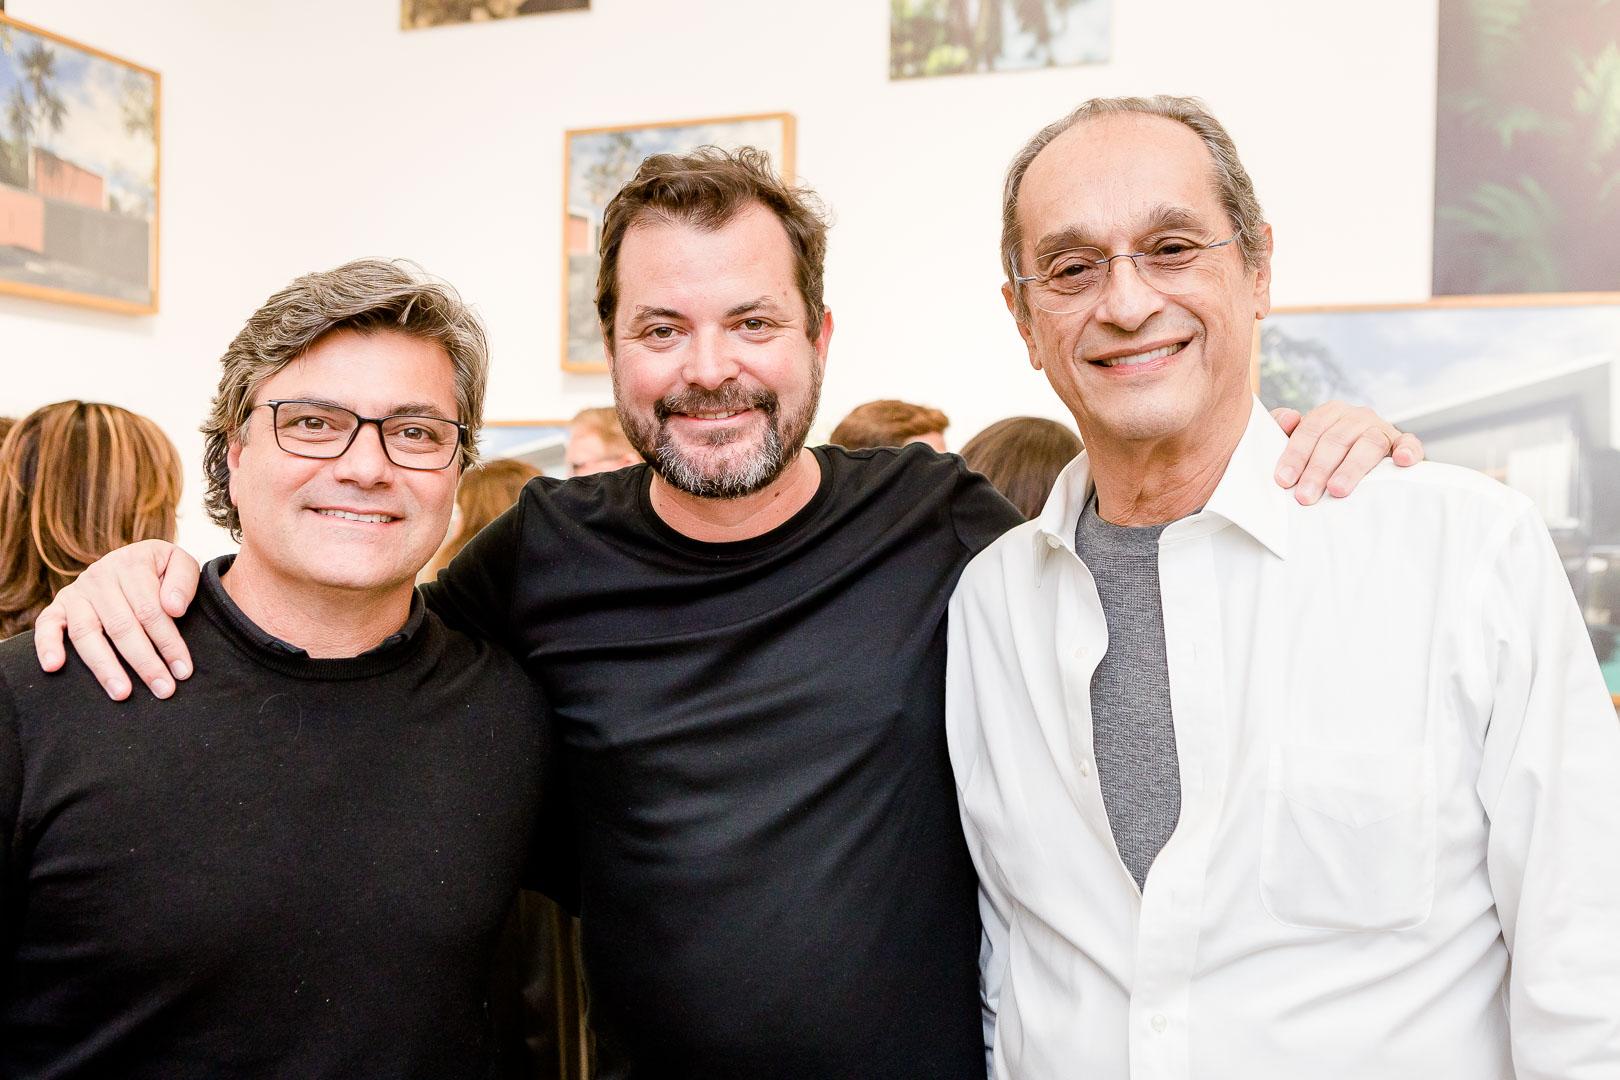 Miguel Pinto Guimaraes e Indio da Costa_